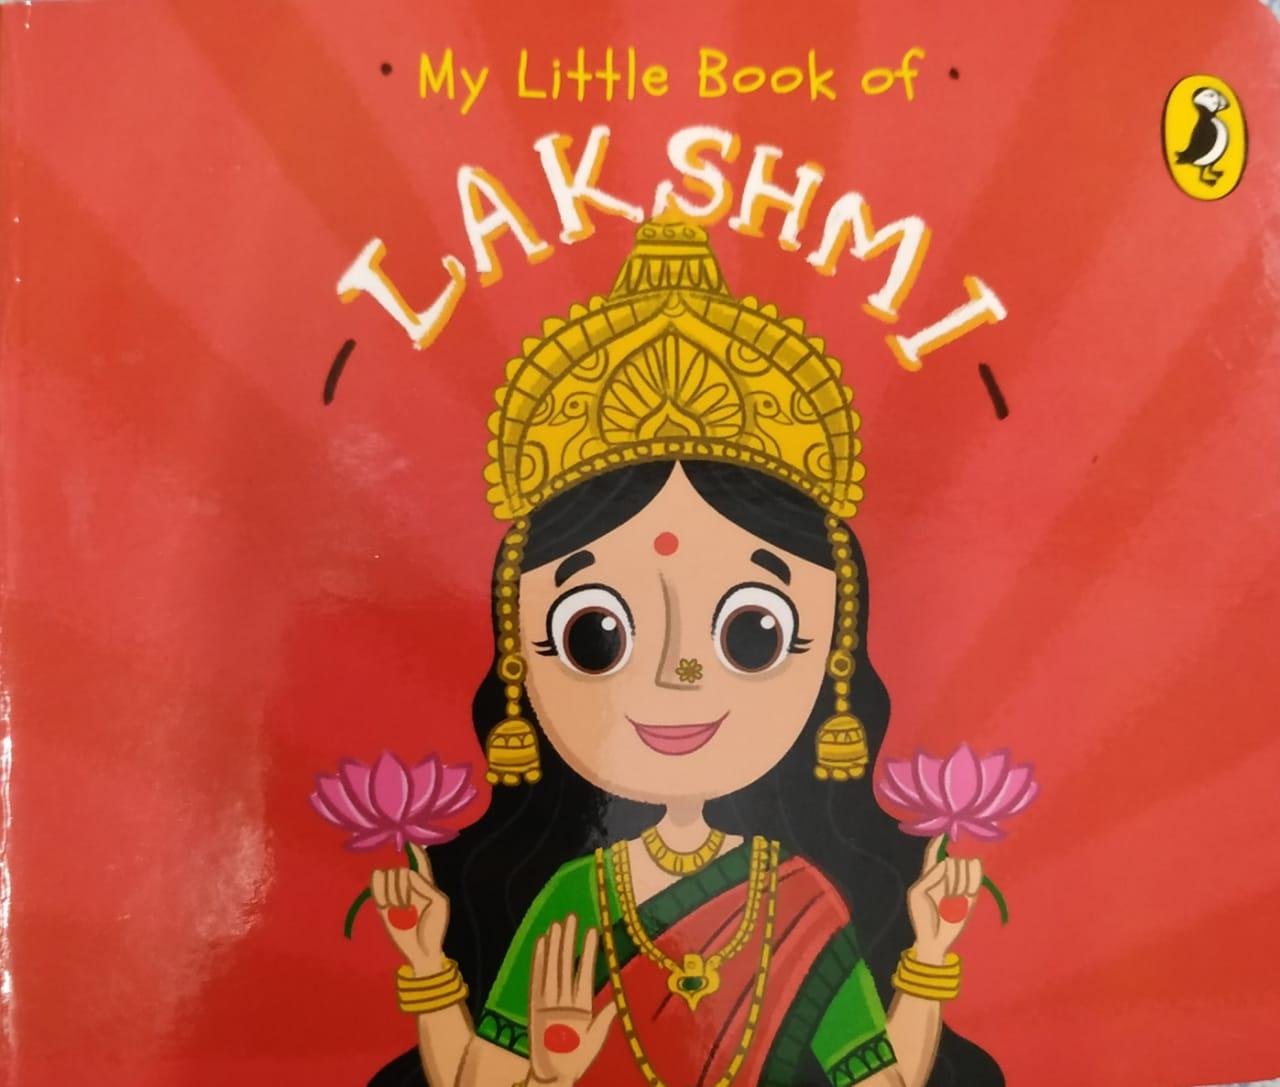 Review: My Little Book of Lakshmi